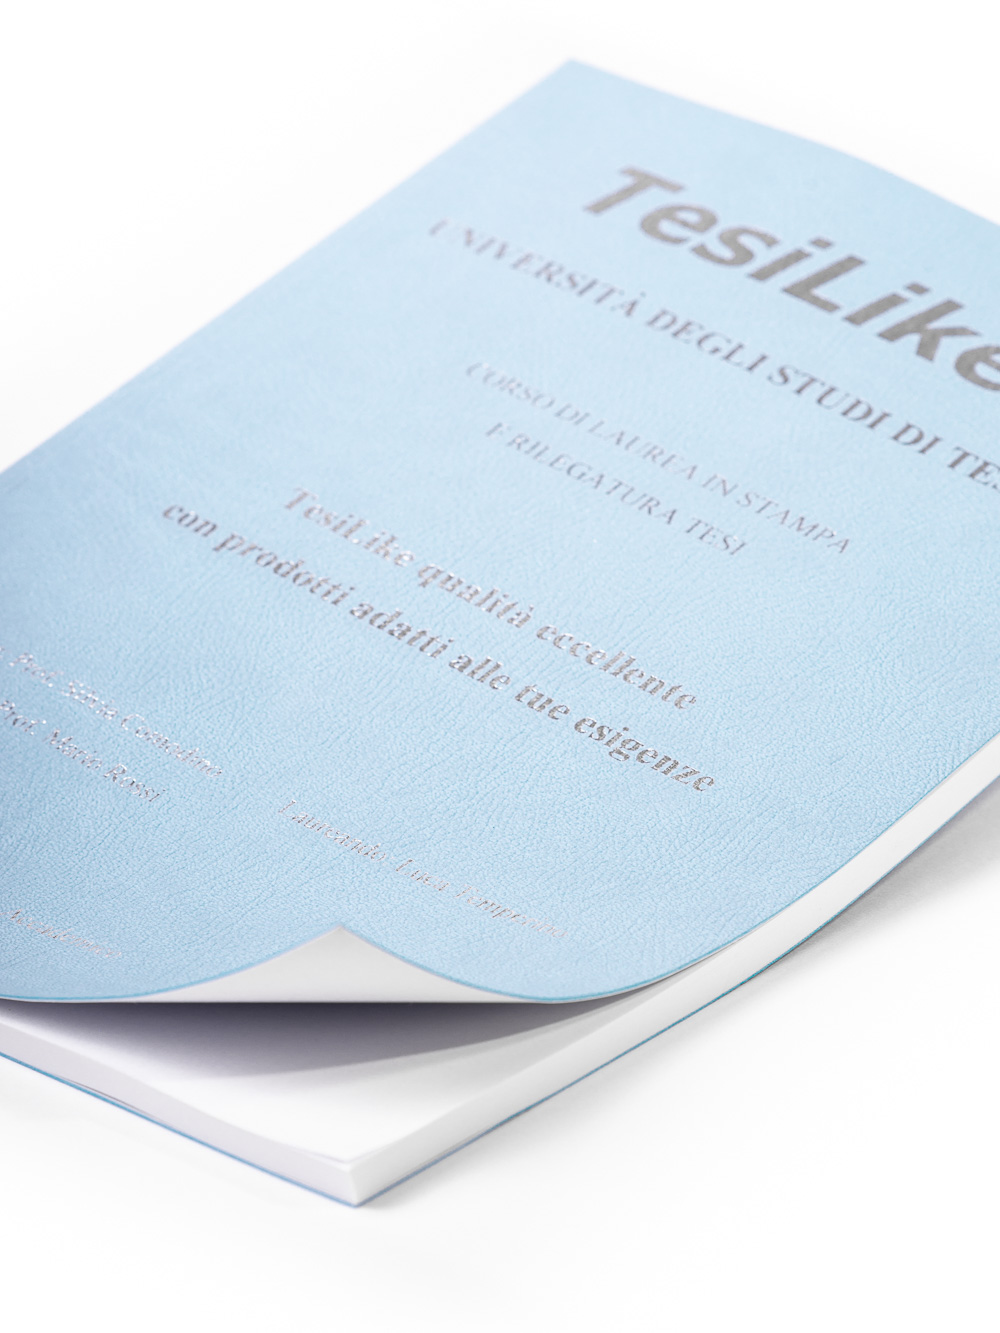 copertina-tesi-flessibile-morbida-azzurra-frontespizio-argento-dettaglio-tesilike